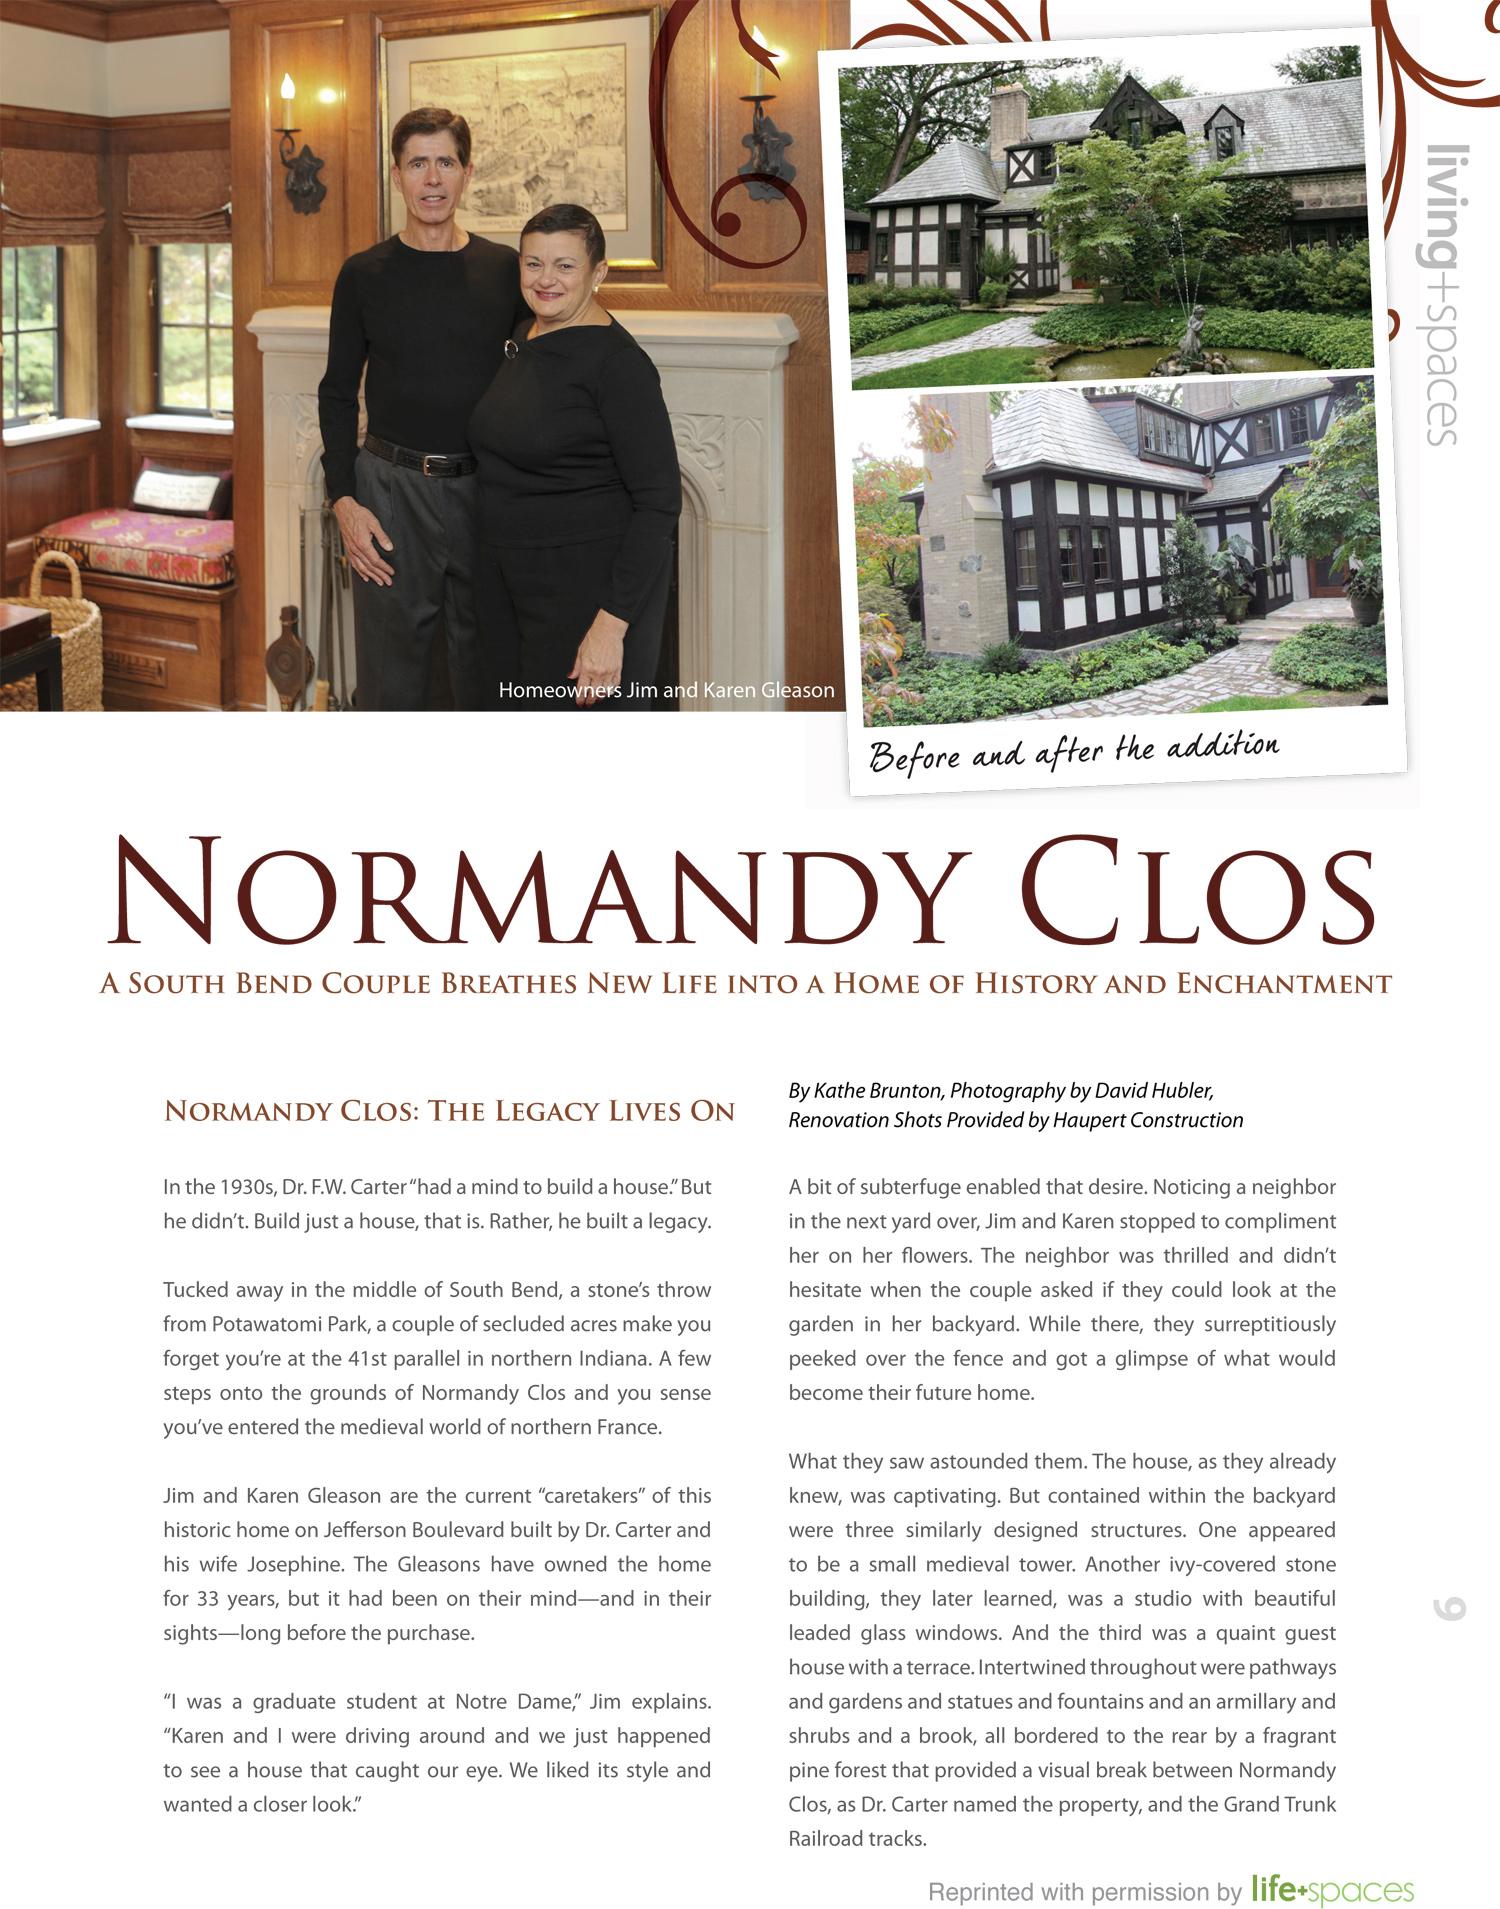 Normandy-Clos-Article-pg-1.jpg